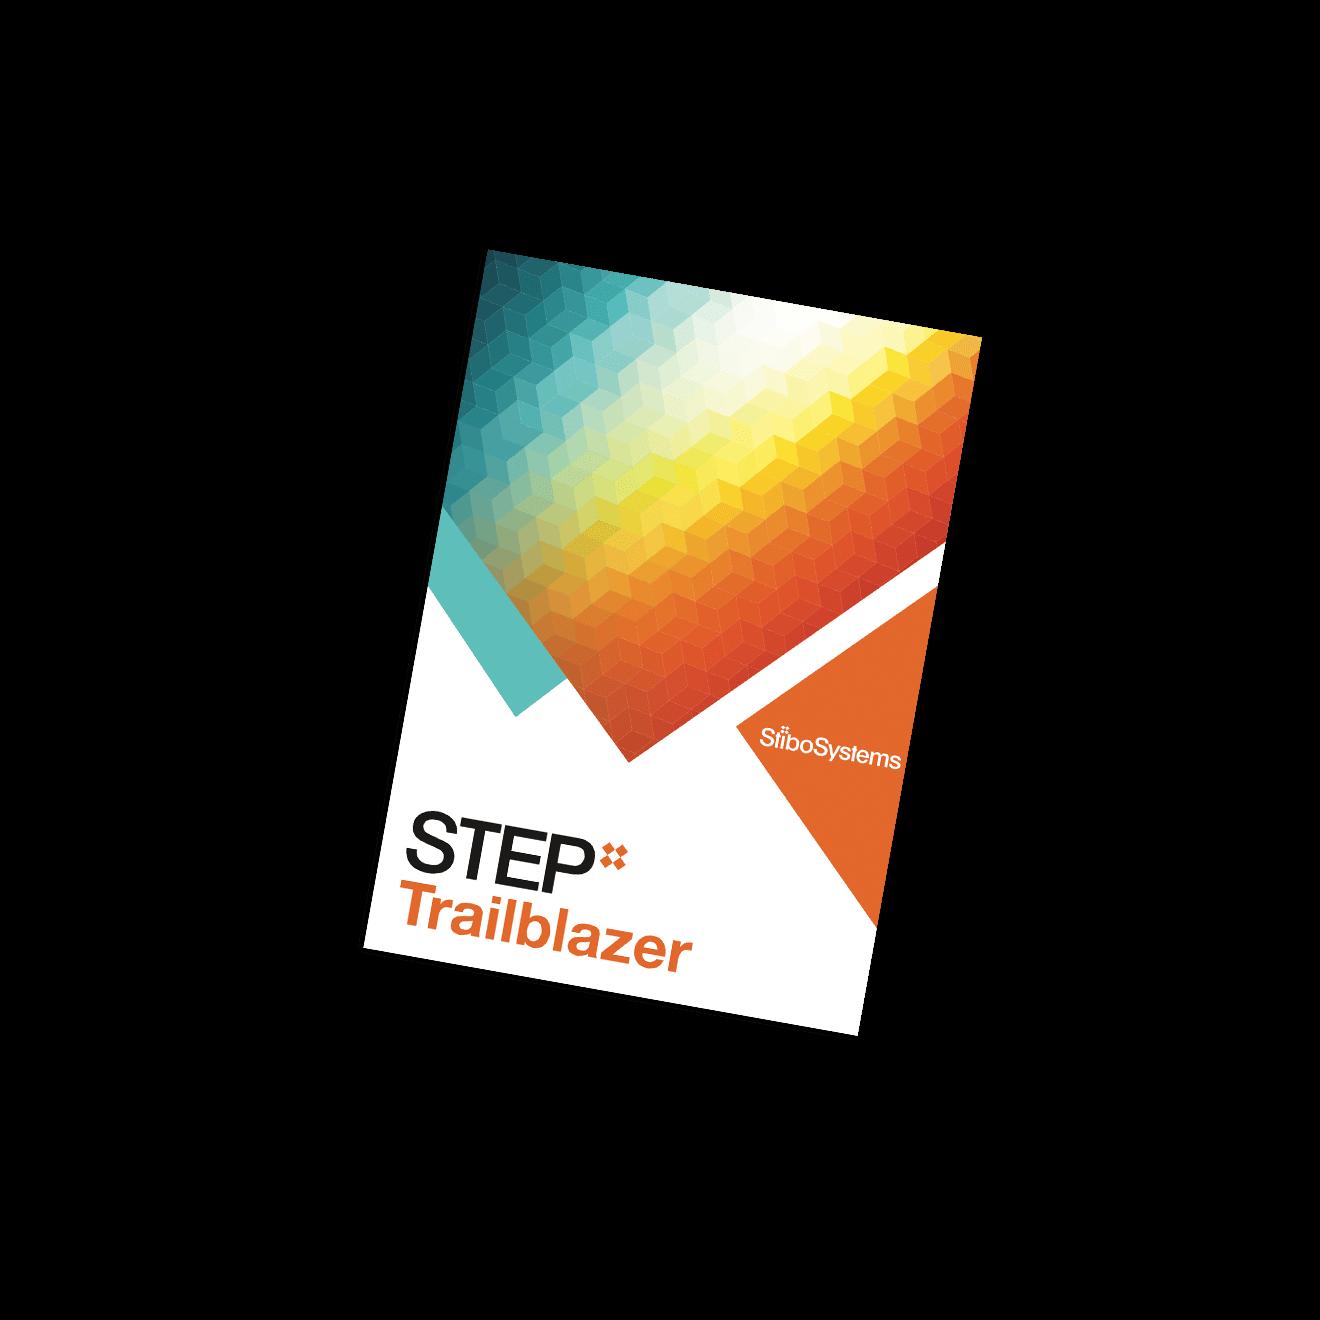 step-trailblazer